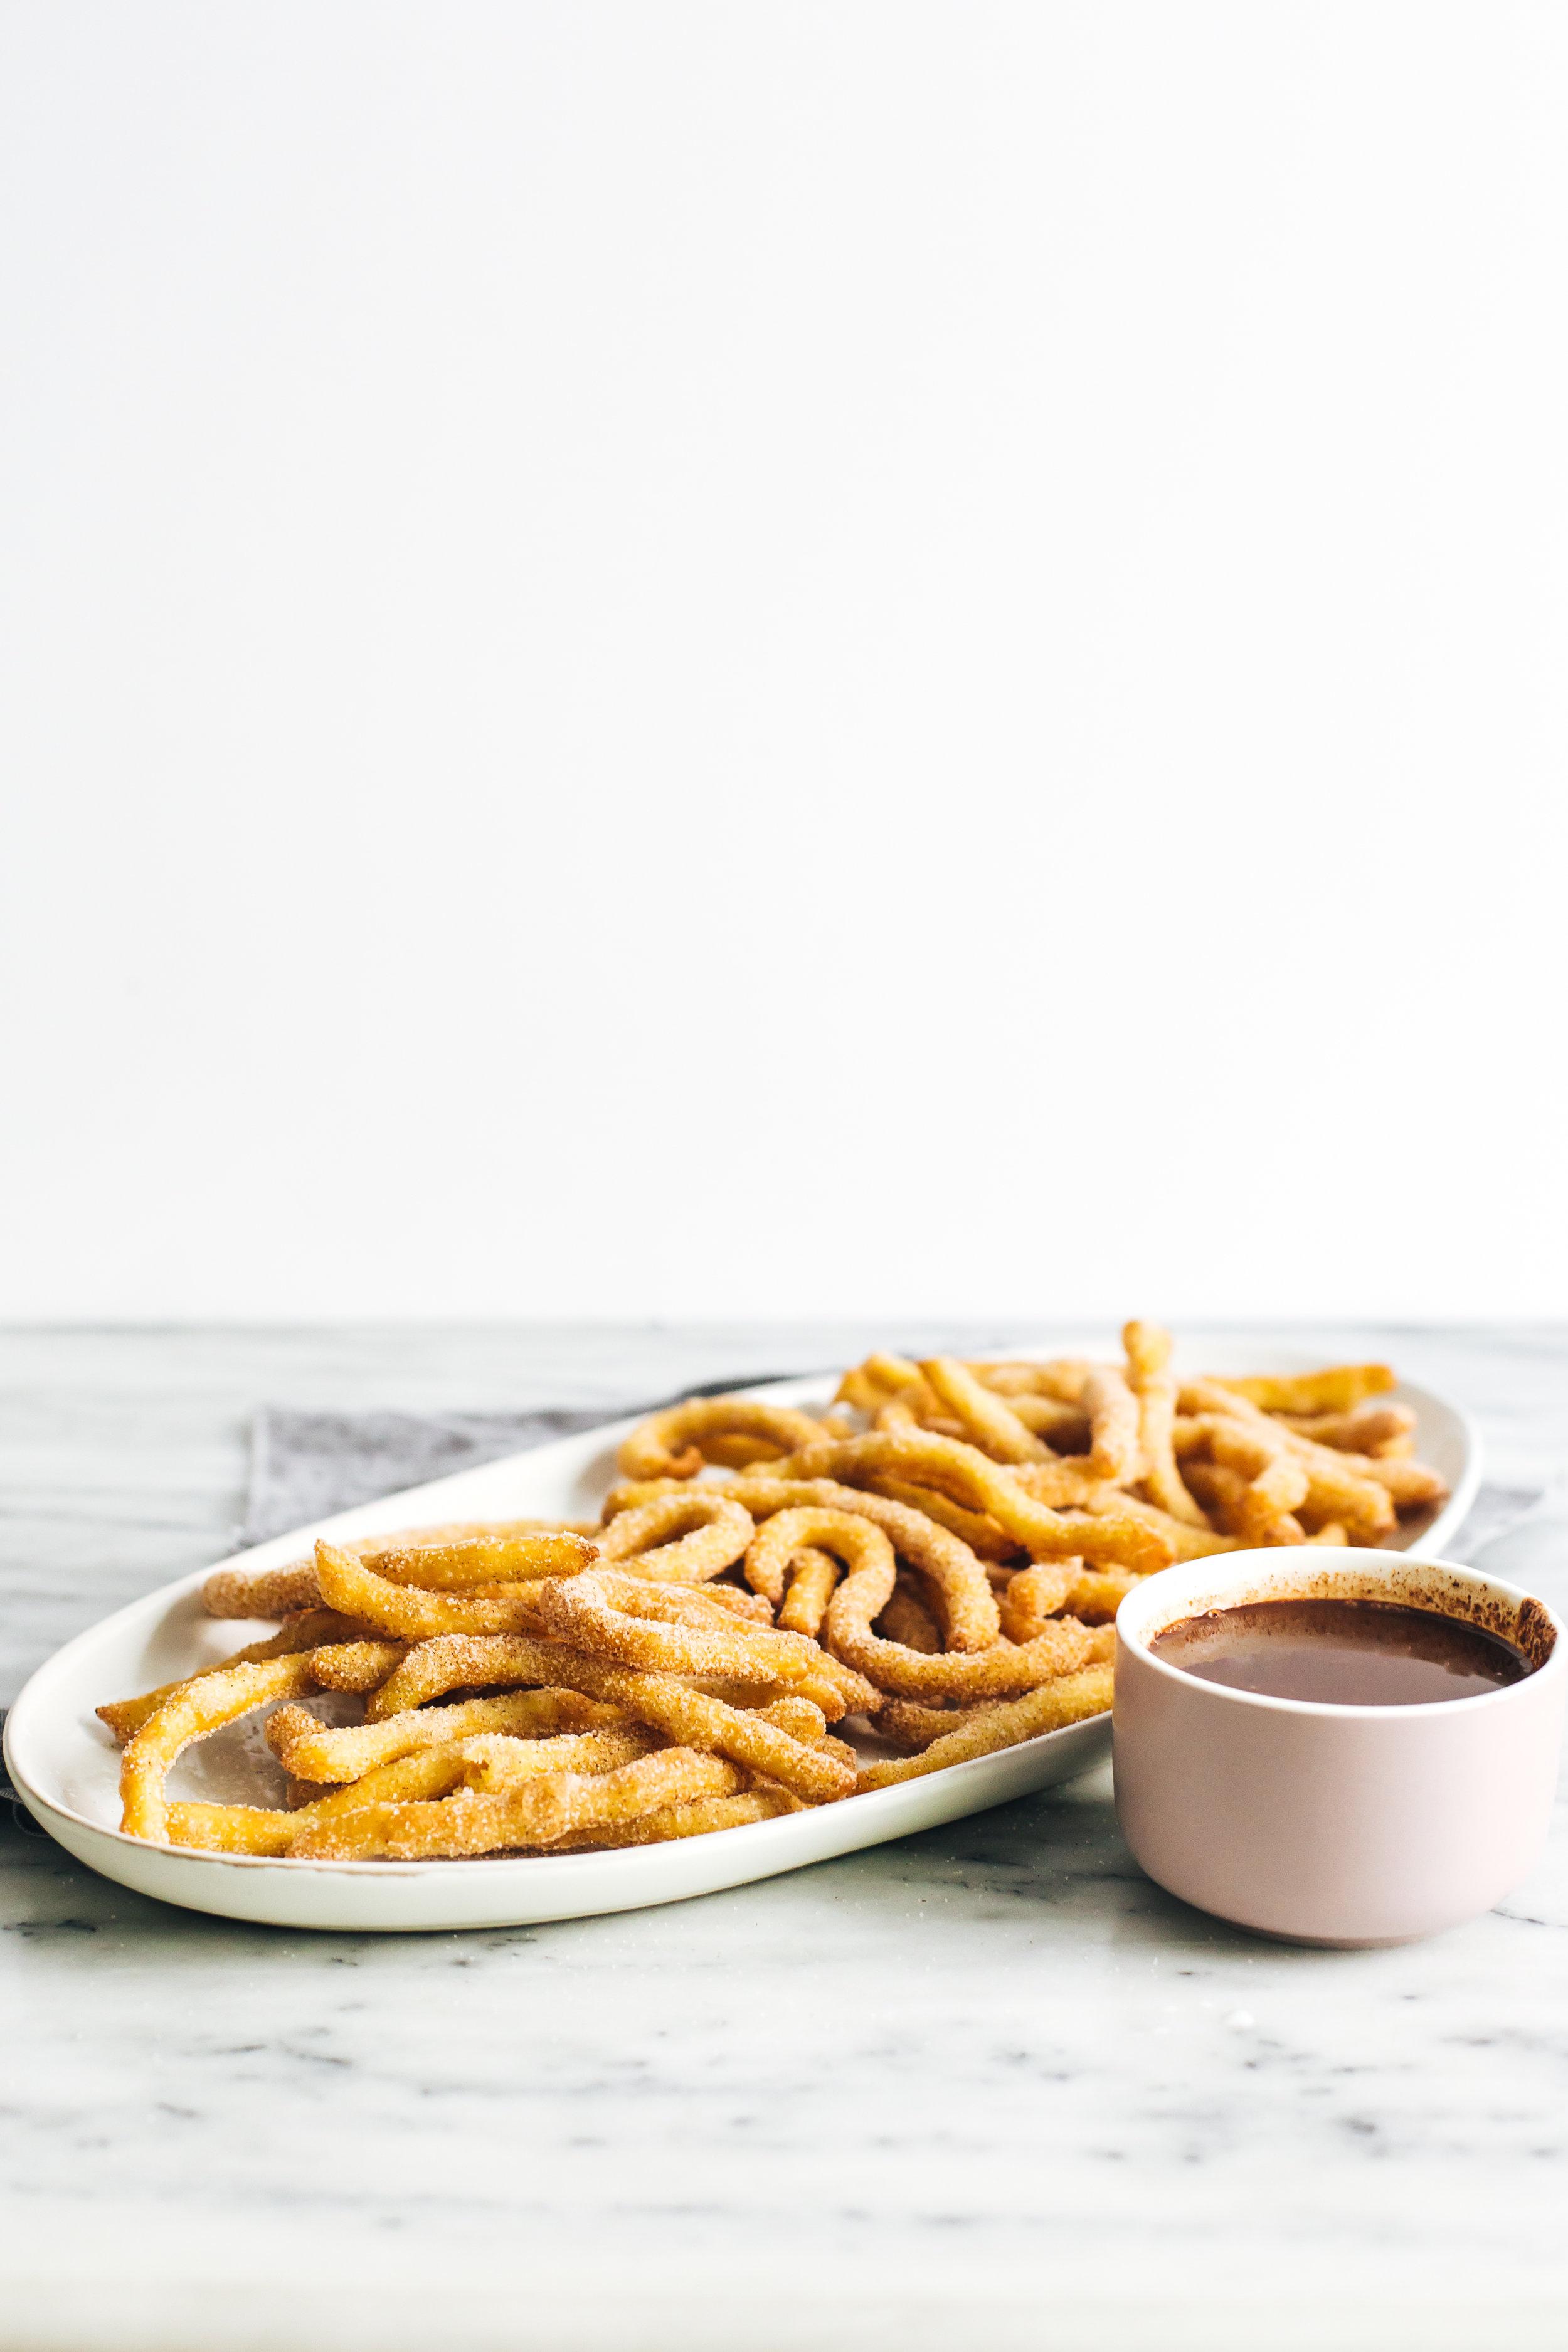 churro_fries_spicy_chocolate_dip-6.jpg